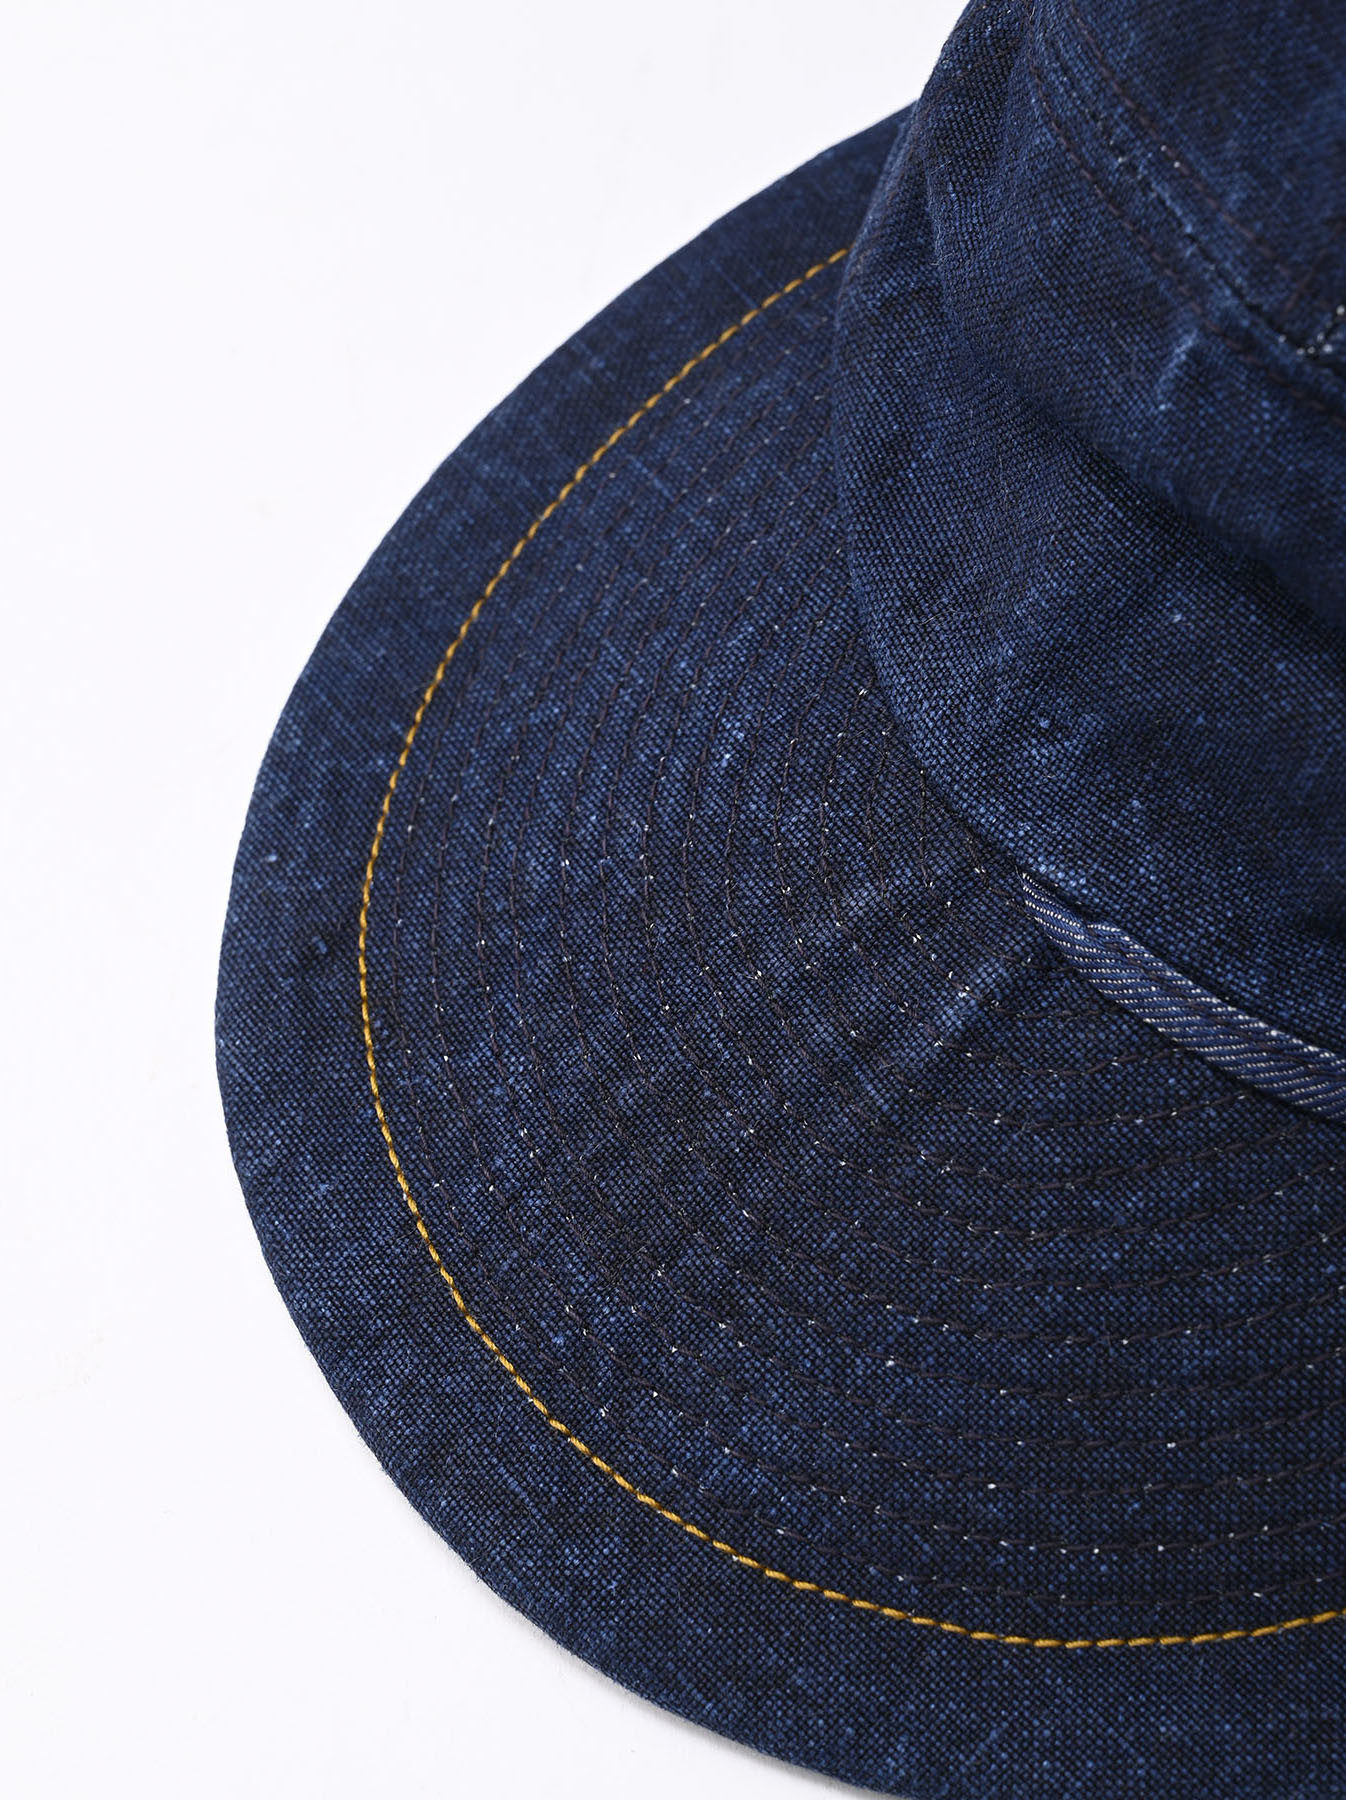 Indigo Linen Duck Cap (0421)-3